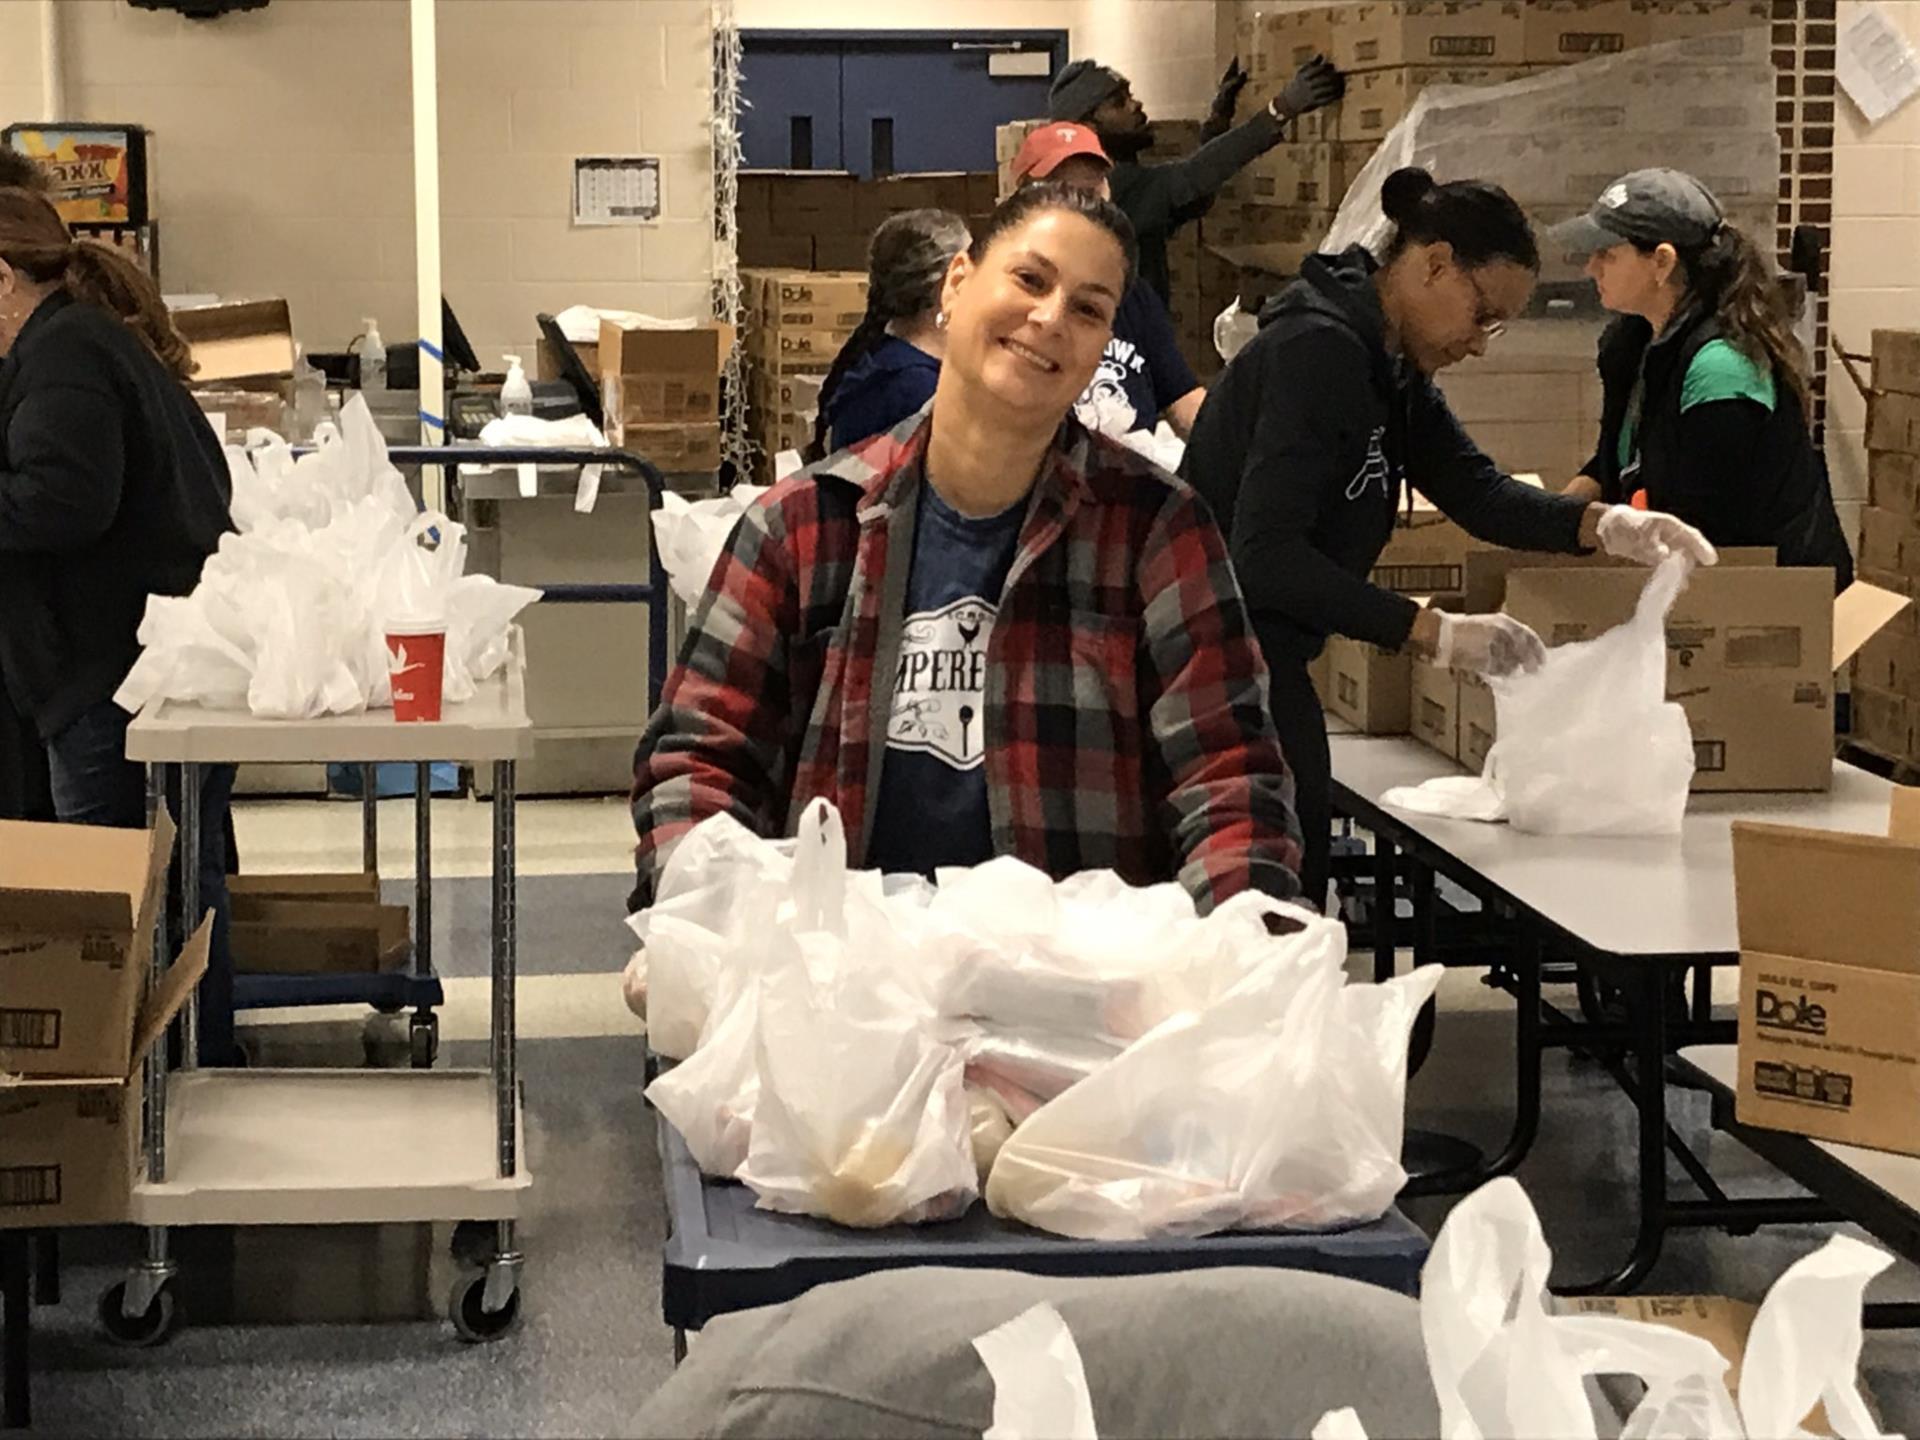 Tara helping to distribute